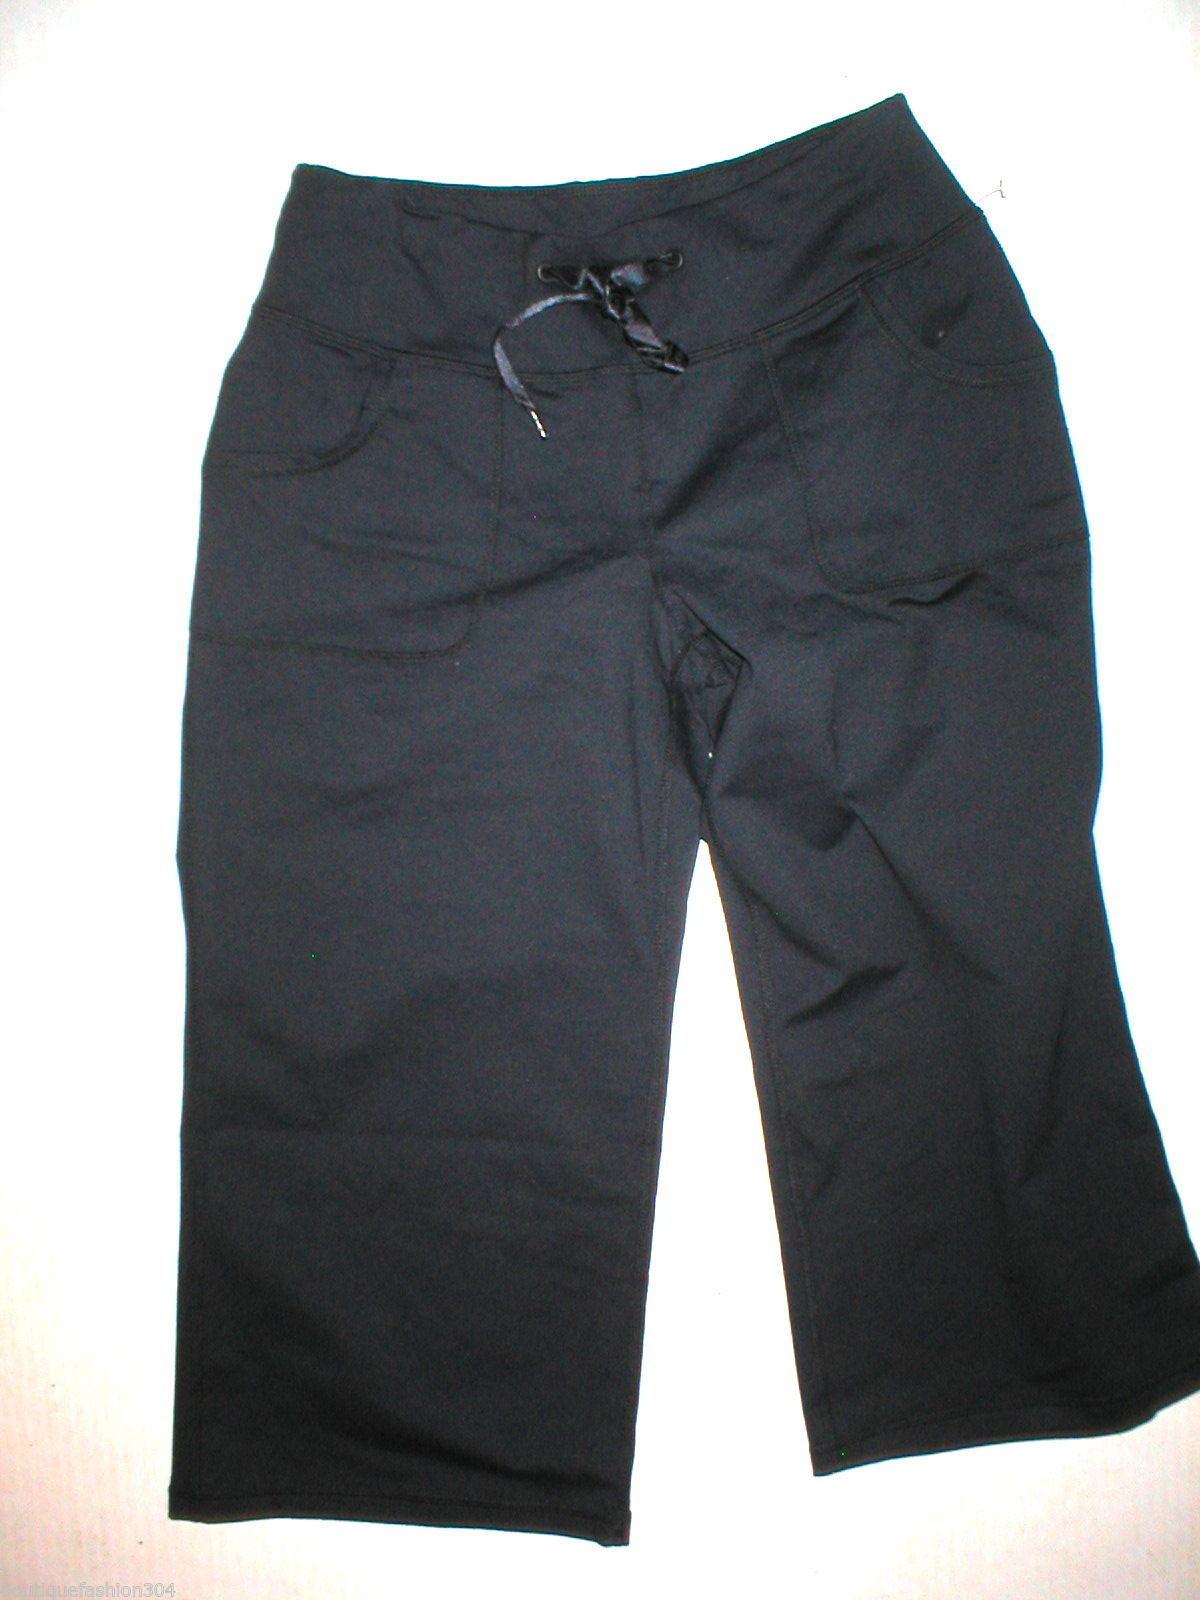 Women New Zella Nordstrom Pants Gym 0 Black Crop Capri Soul 2 Barre Yoga Pilate